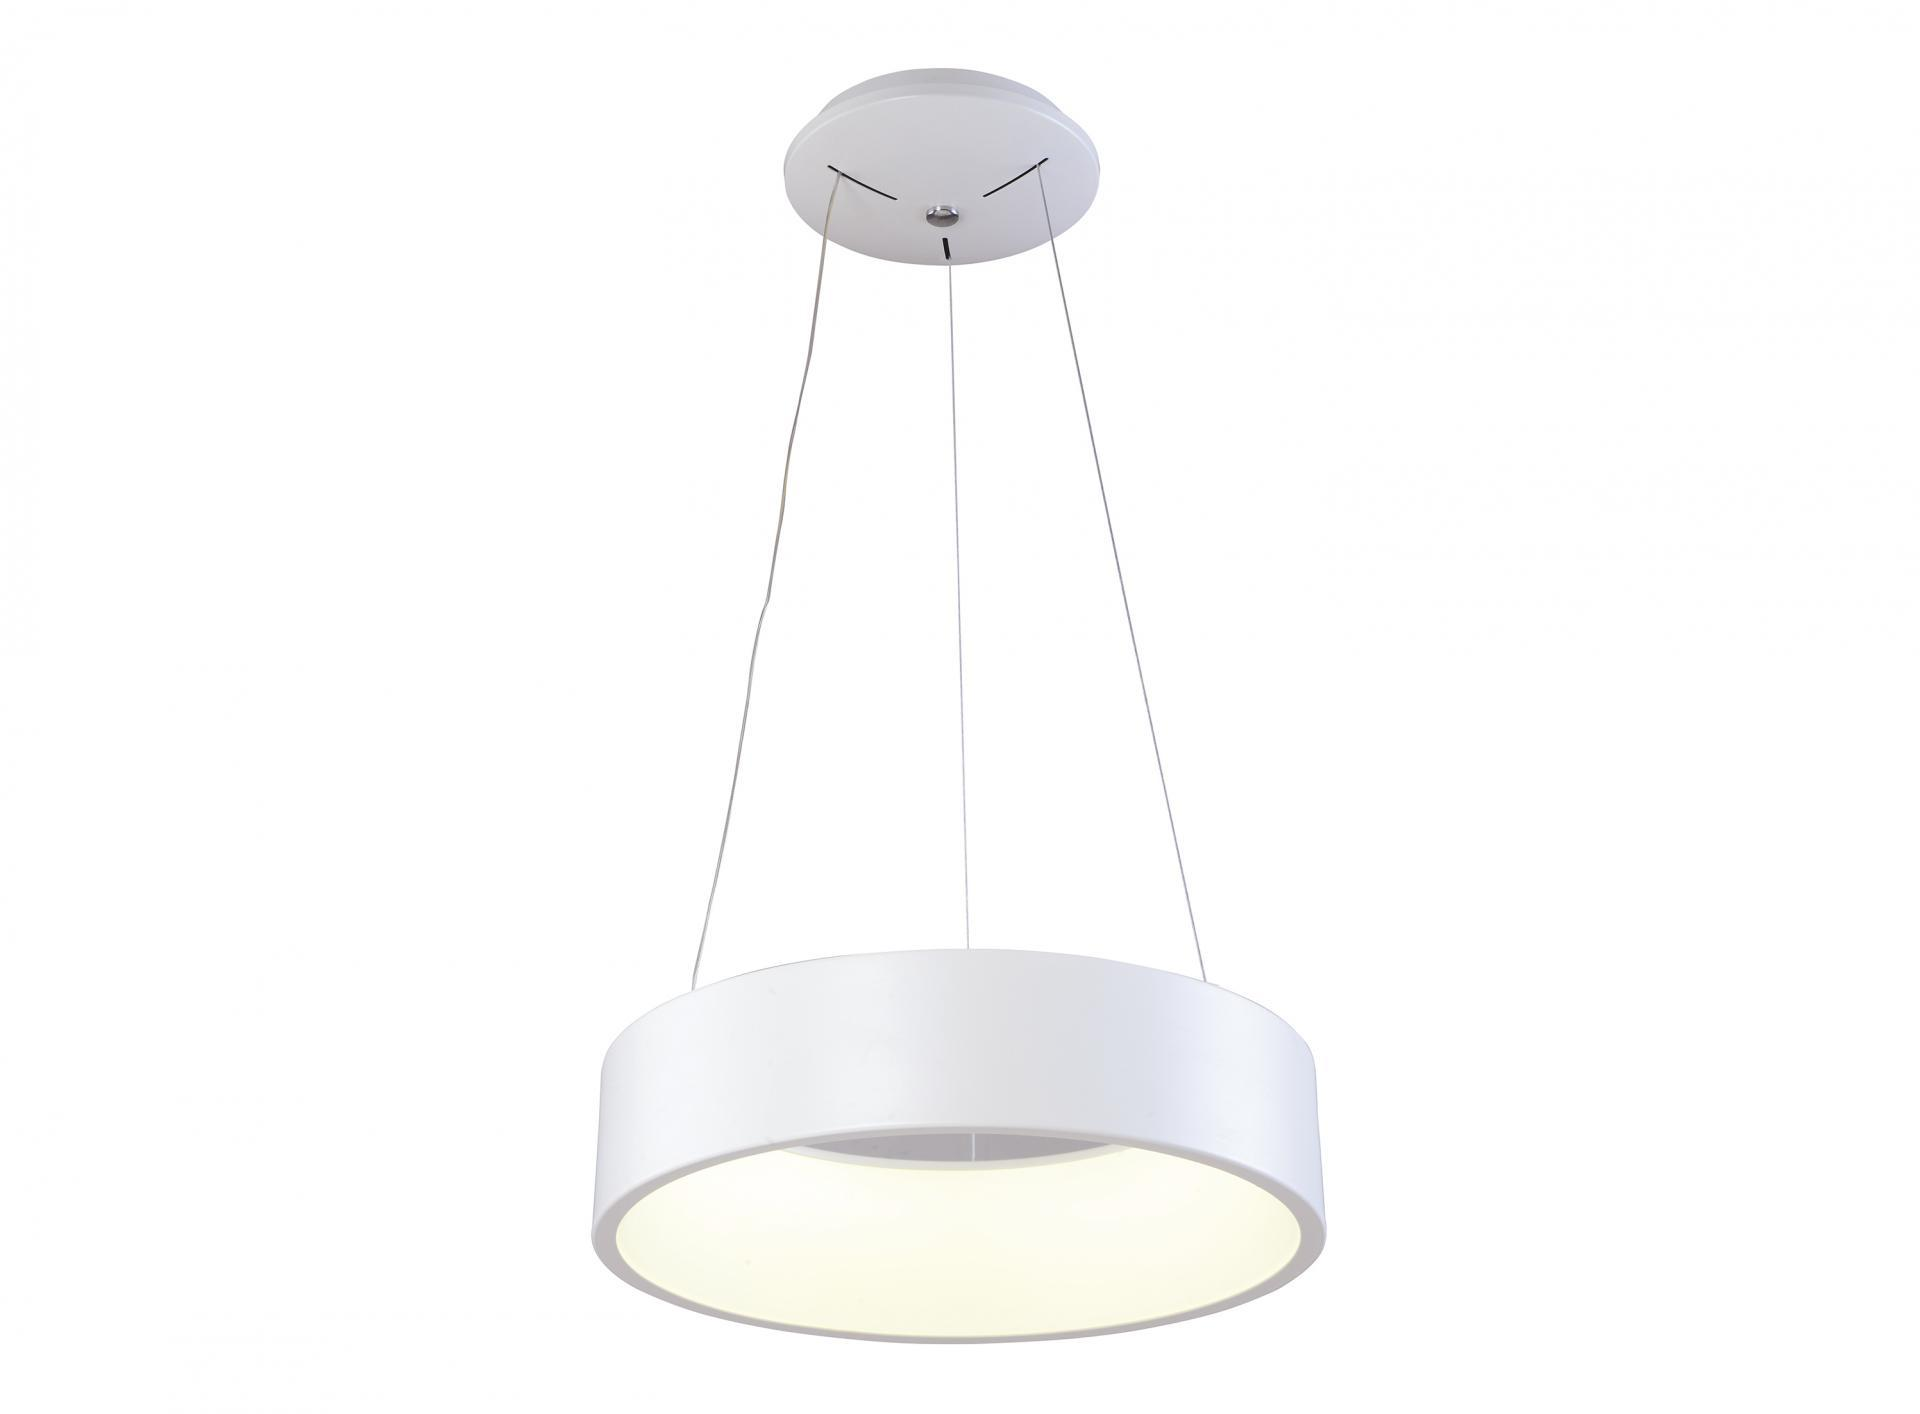 LAMPARA DE TECHO LED COLGANTE  36W 3000K 180º 230V BLANCO